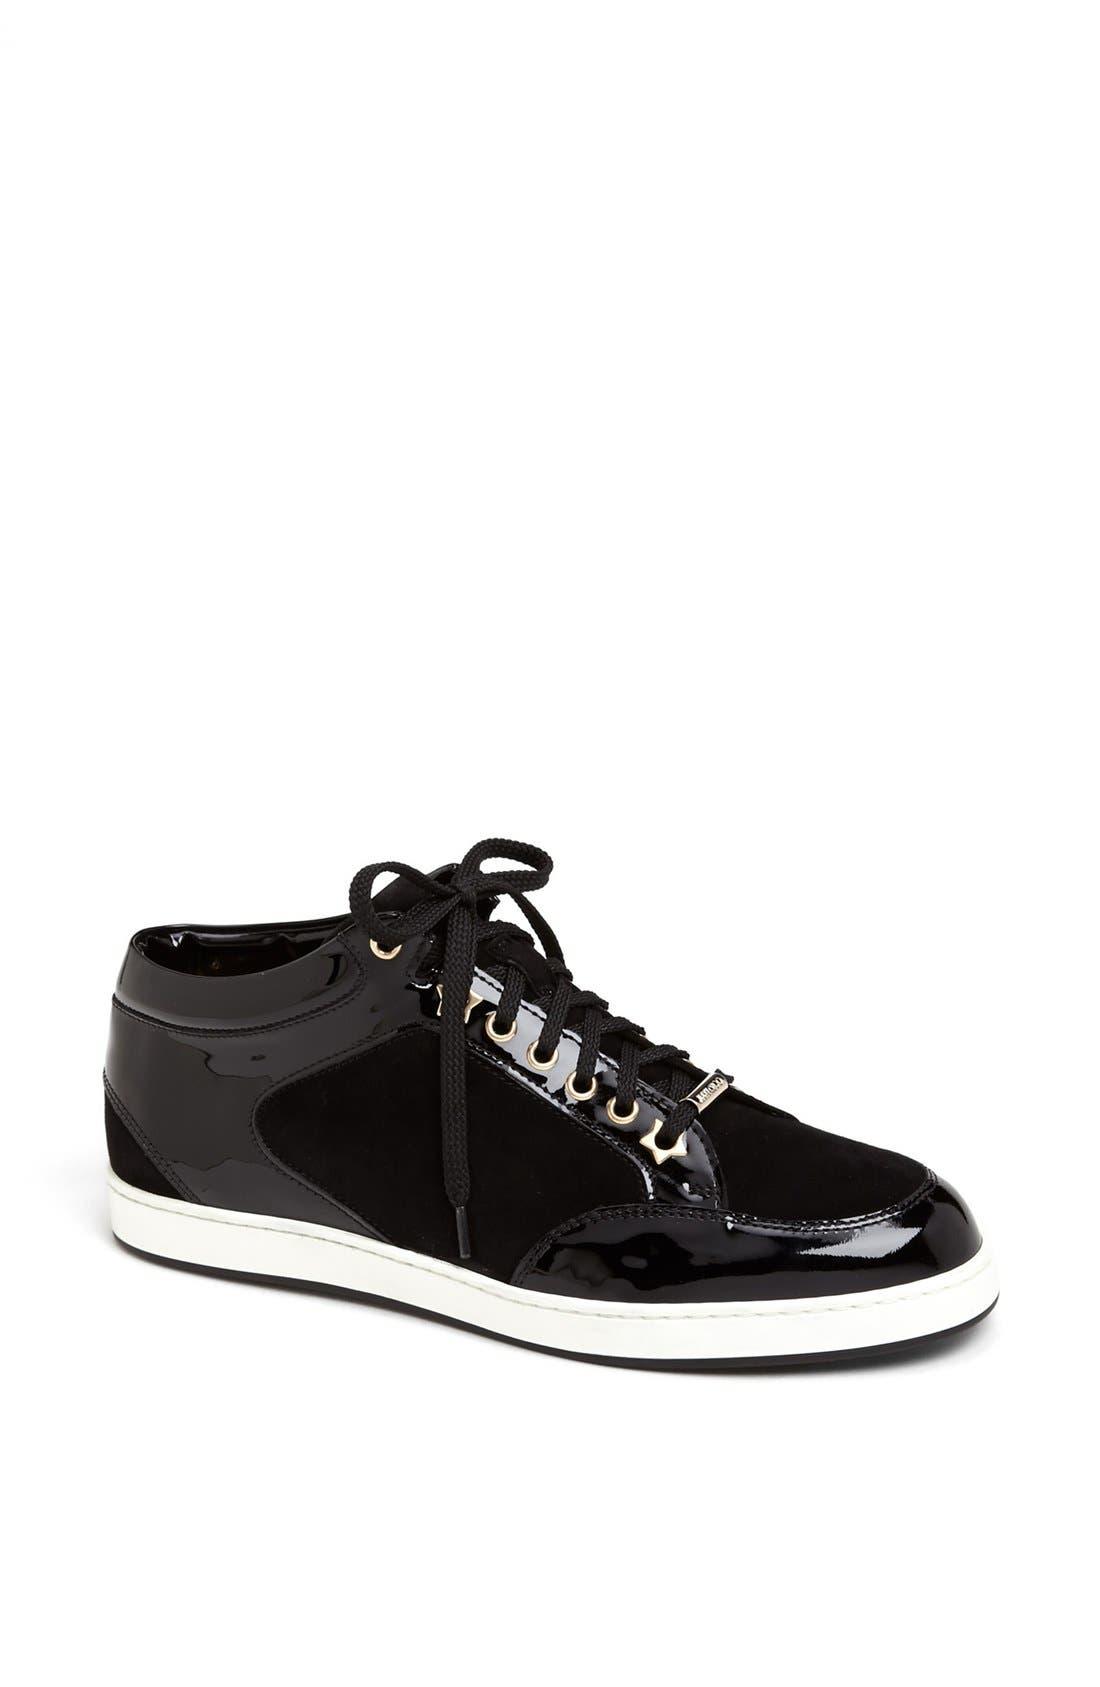 Main Image - Jimmy Choo 'Miami' Sneaker